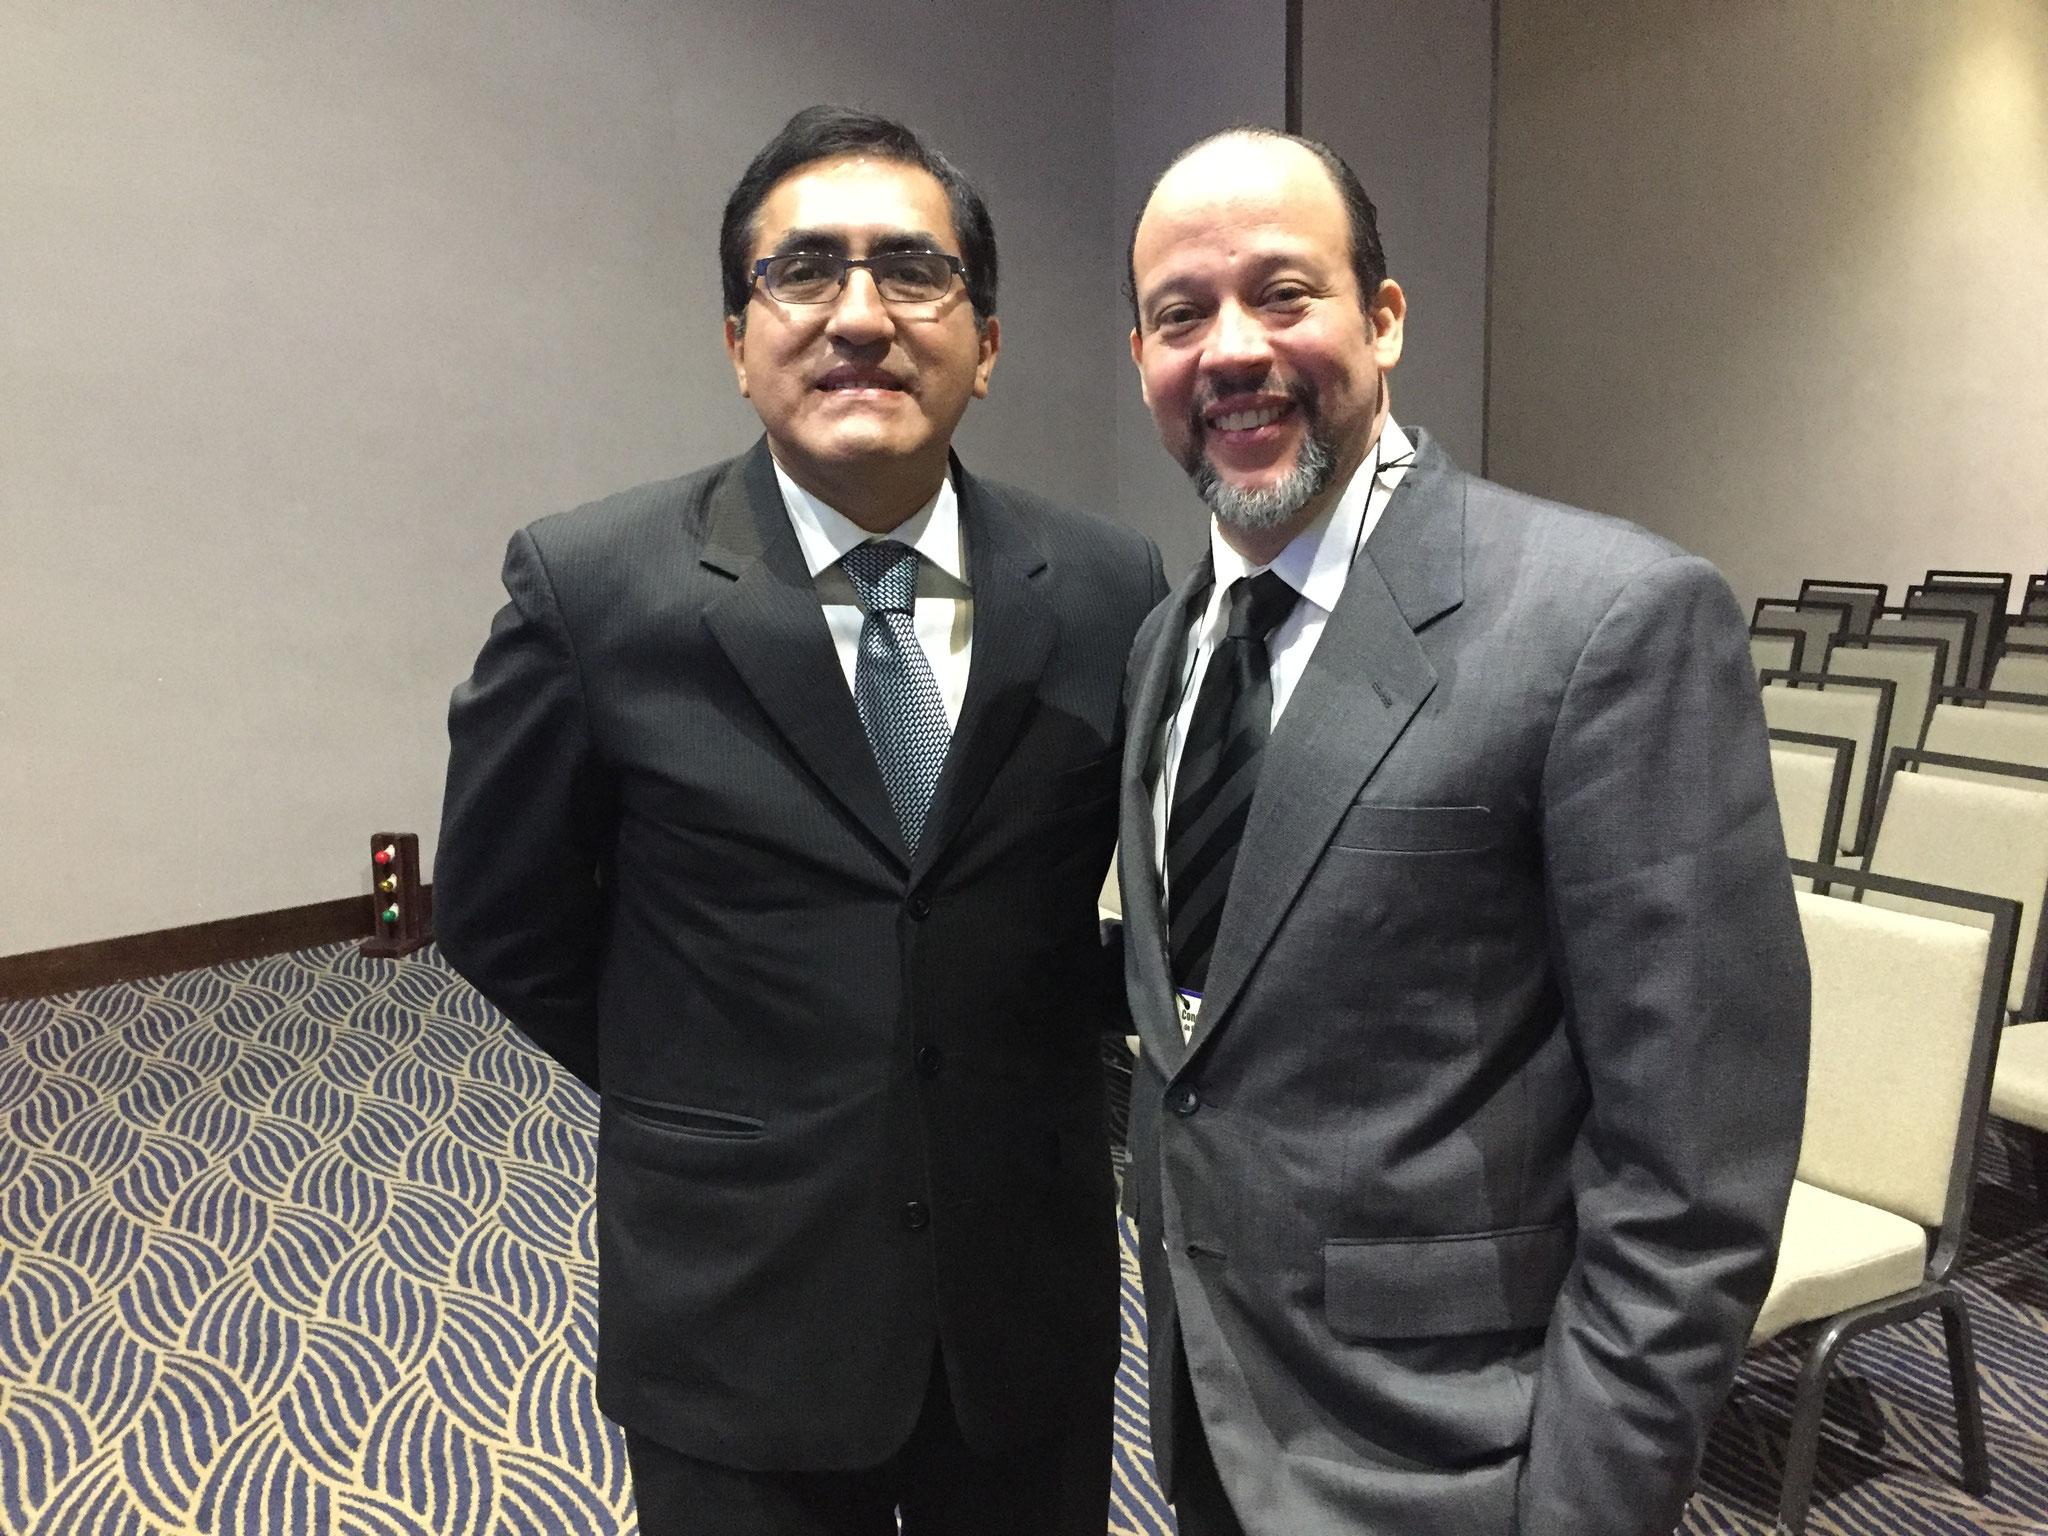 Leopoldo Meneses y Zoilo Nuñez Gil